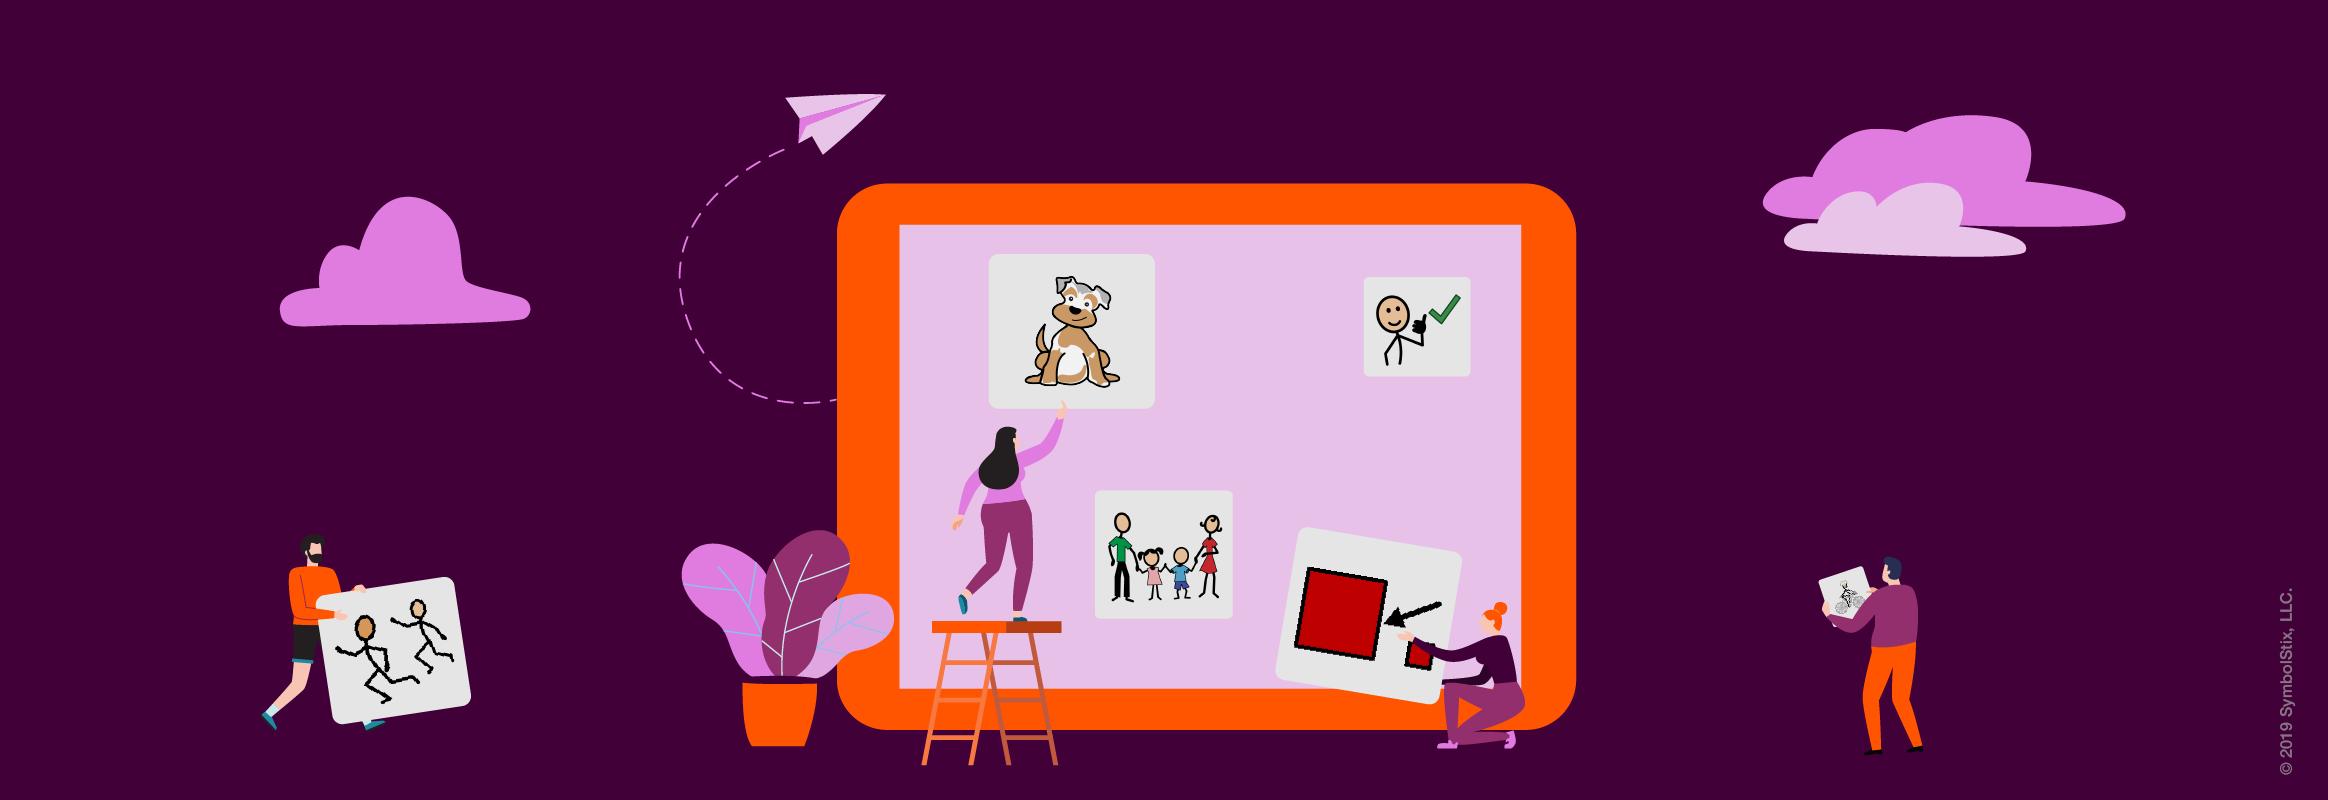 Illustration with people putting symbols on a big iPad